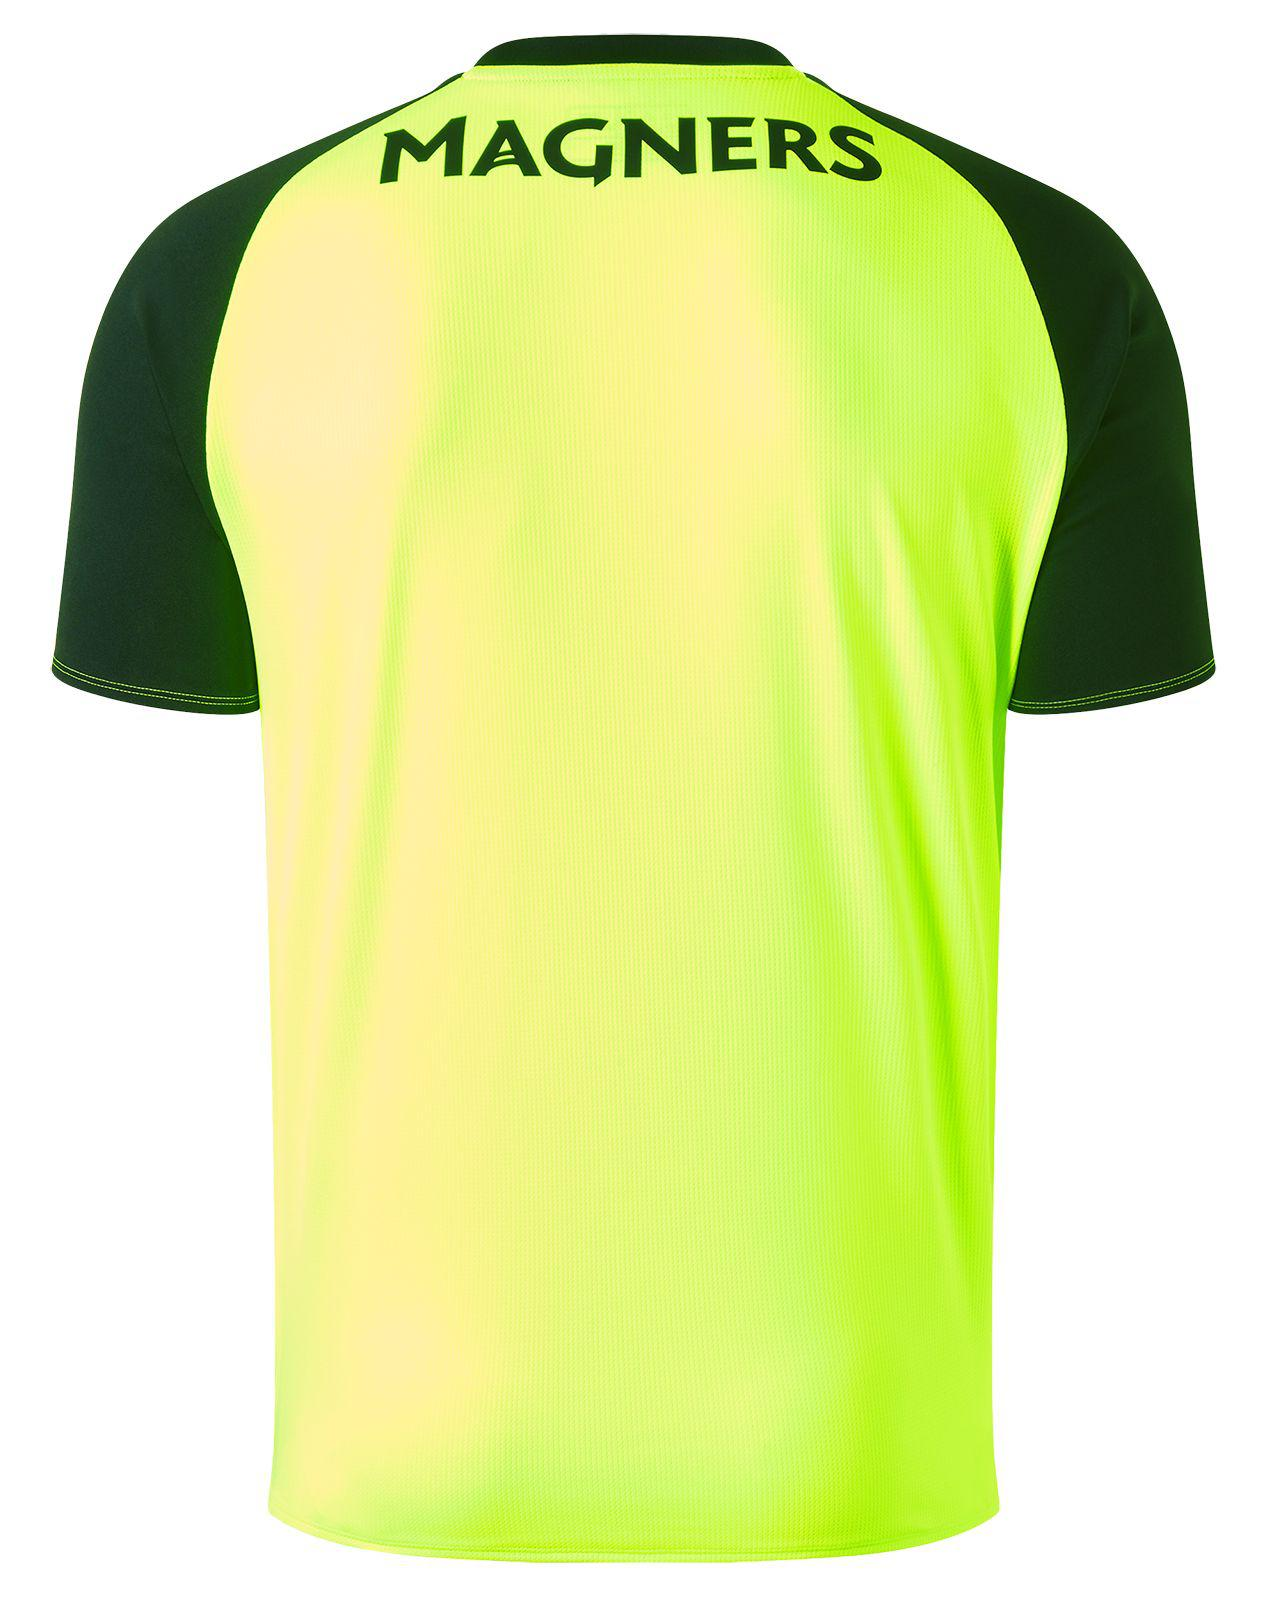 675497c757e Lyst - New Balance Celtic Fc 3rd Short Sleeve Jersey in Black for Men